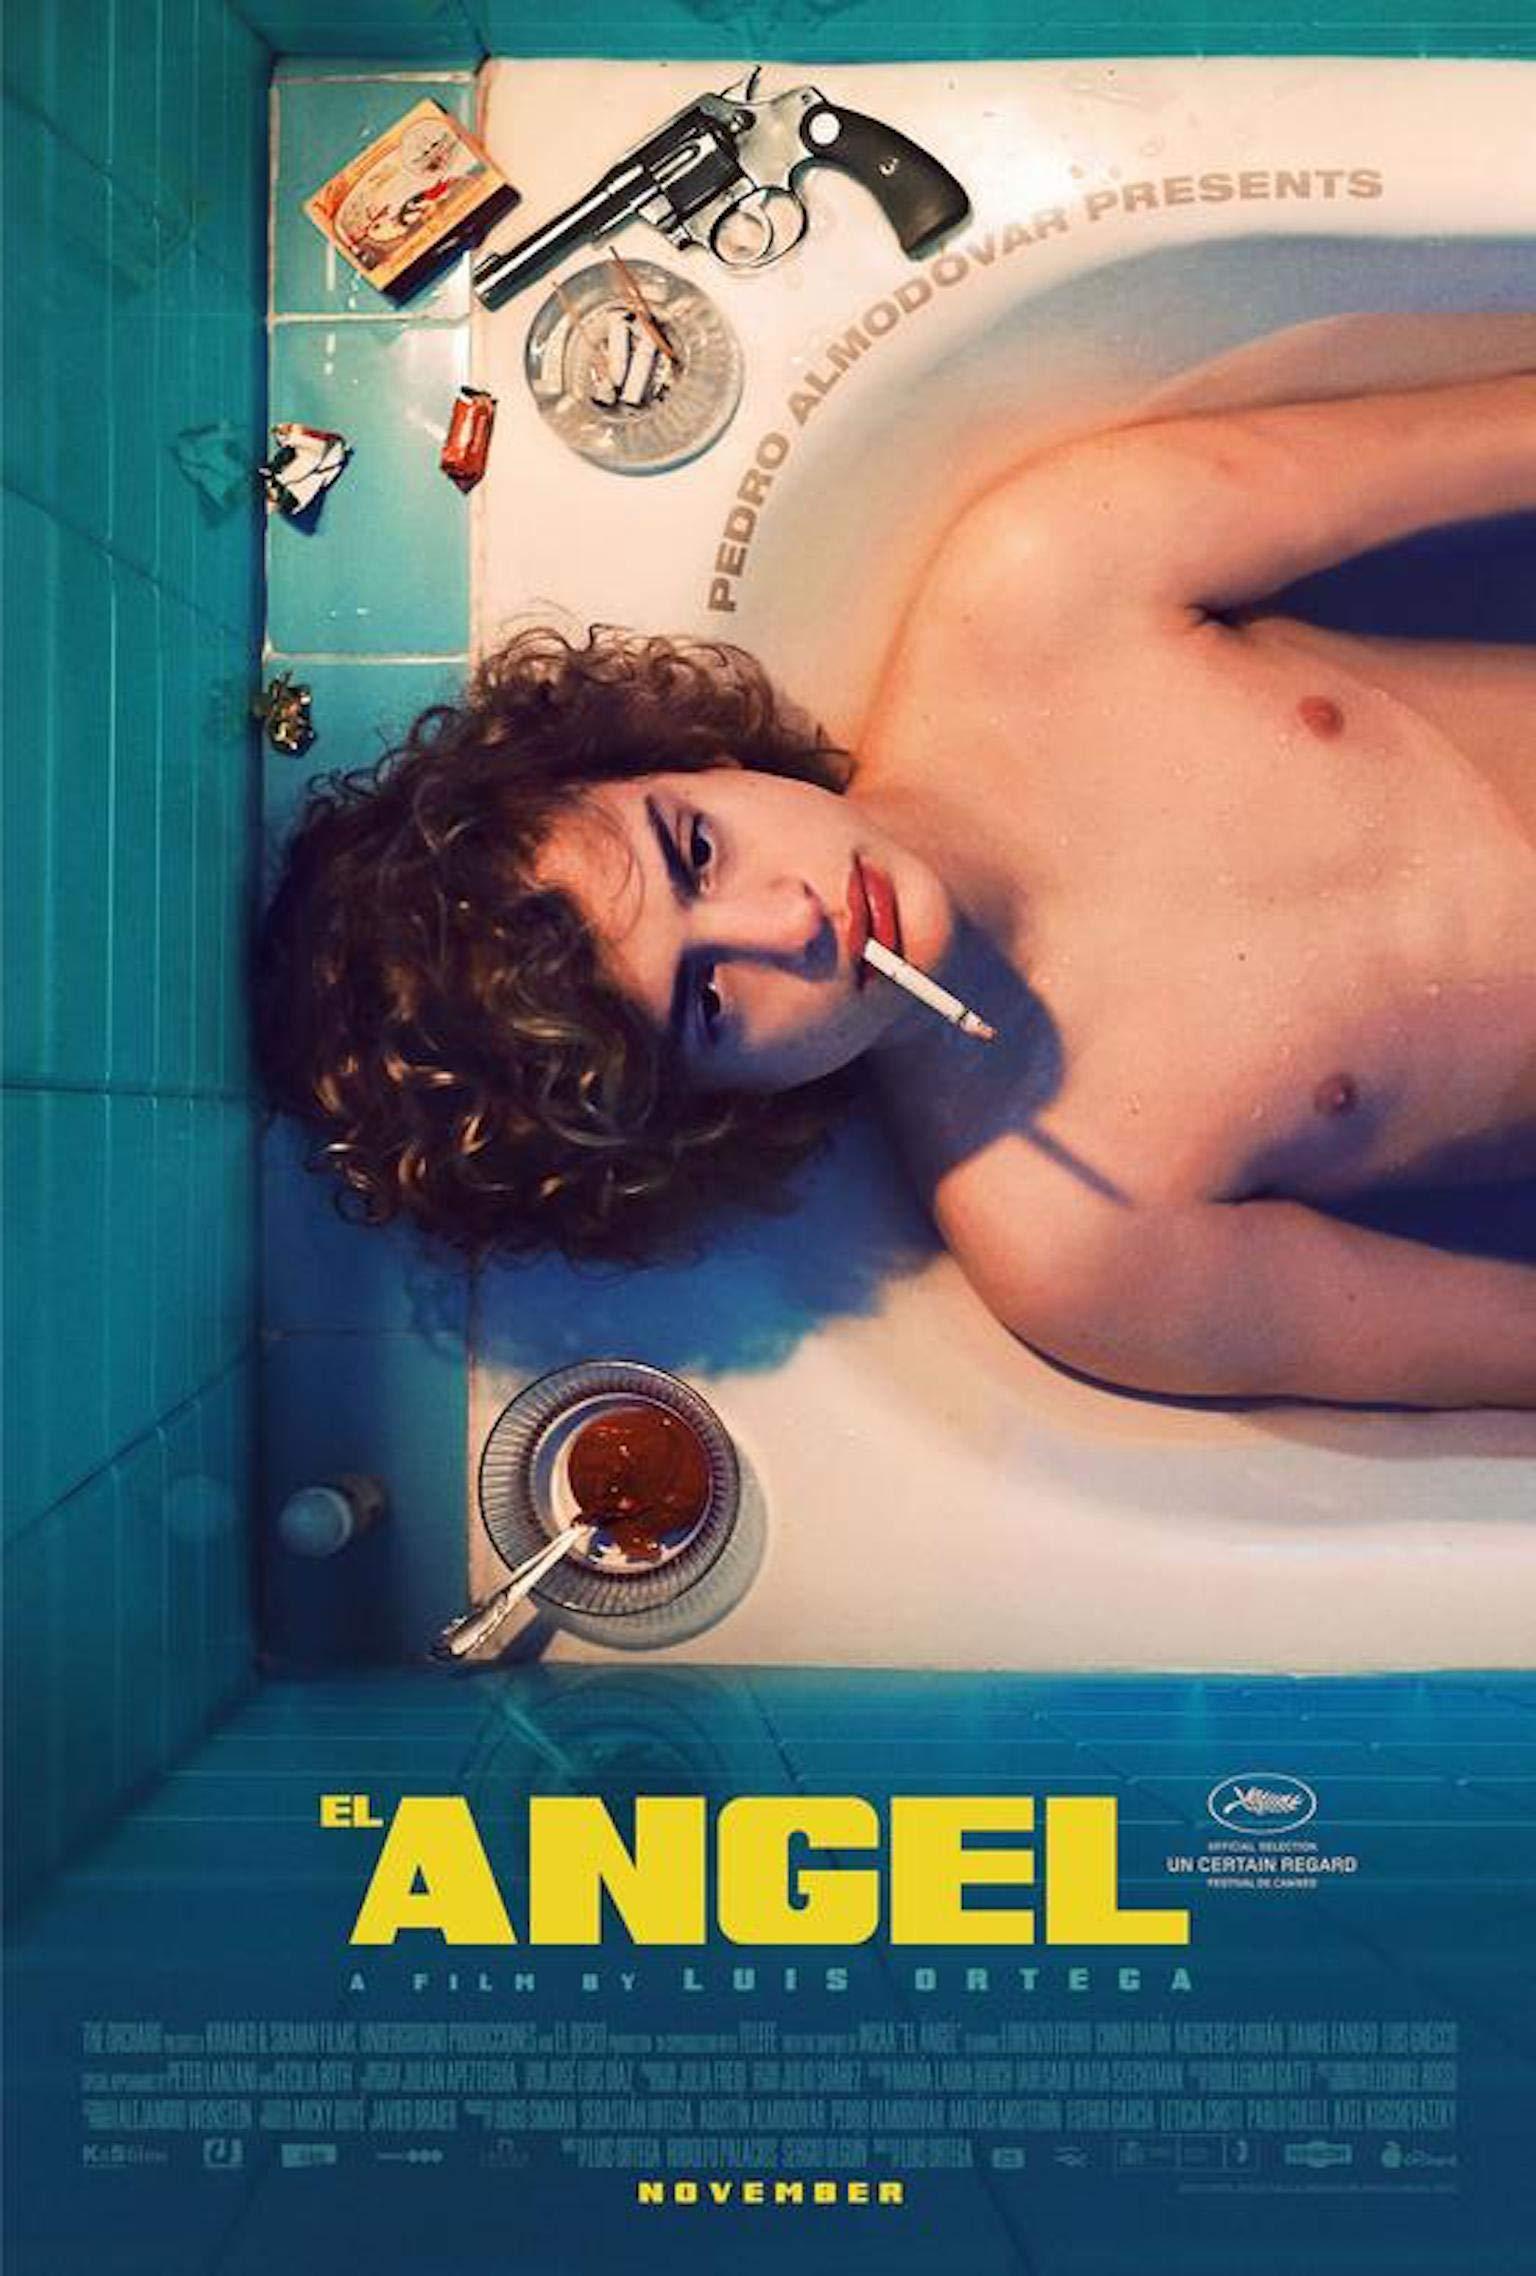 DVD : El Angel (DVD)